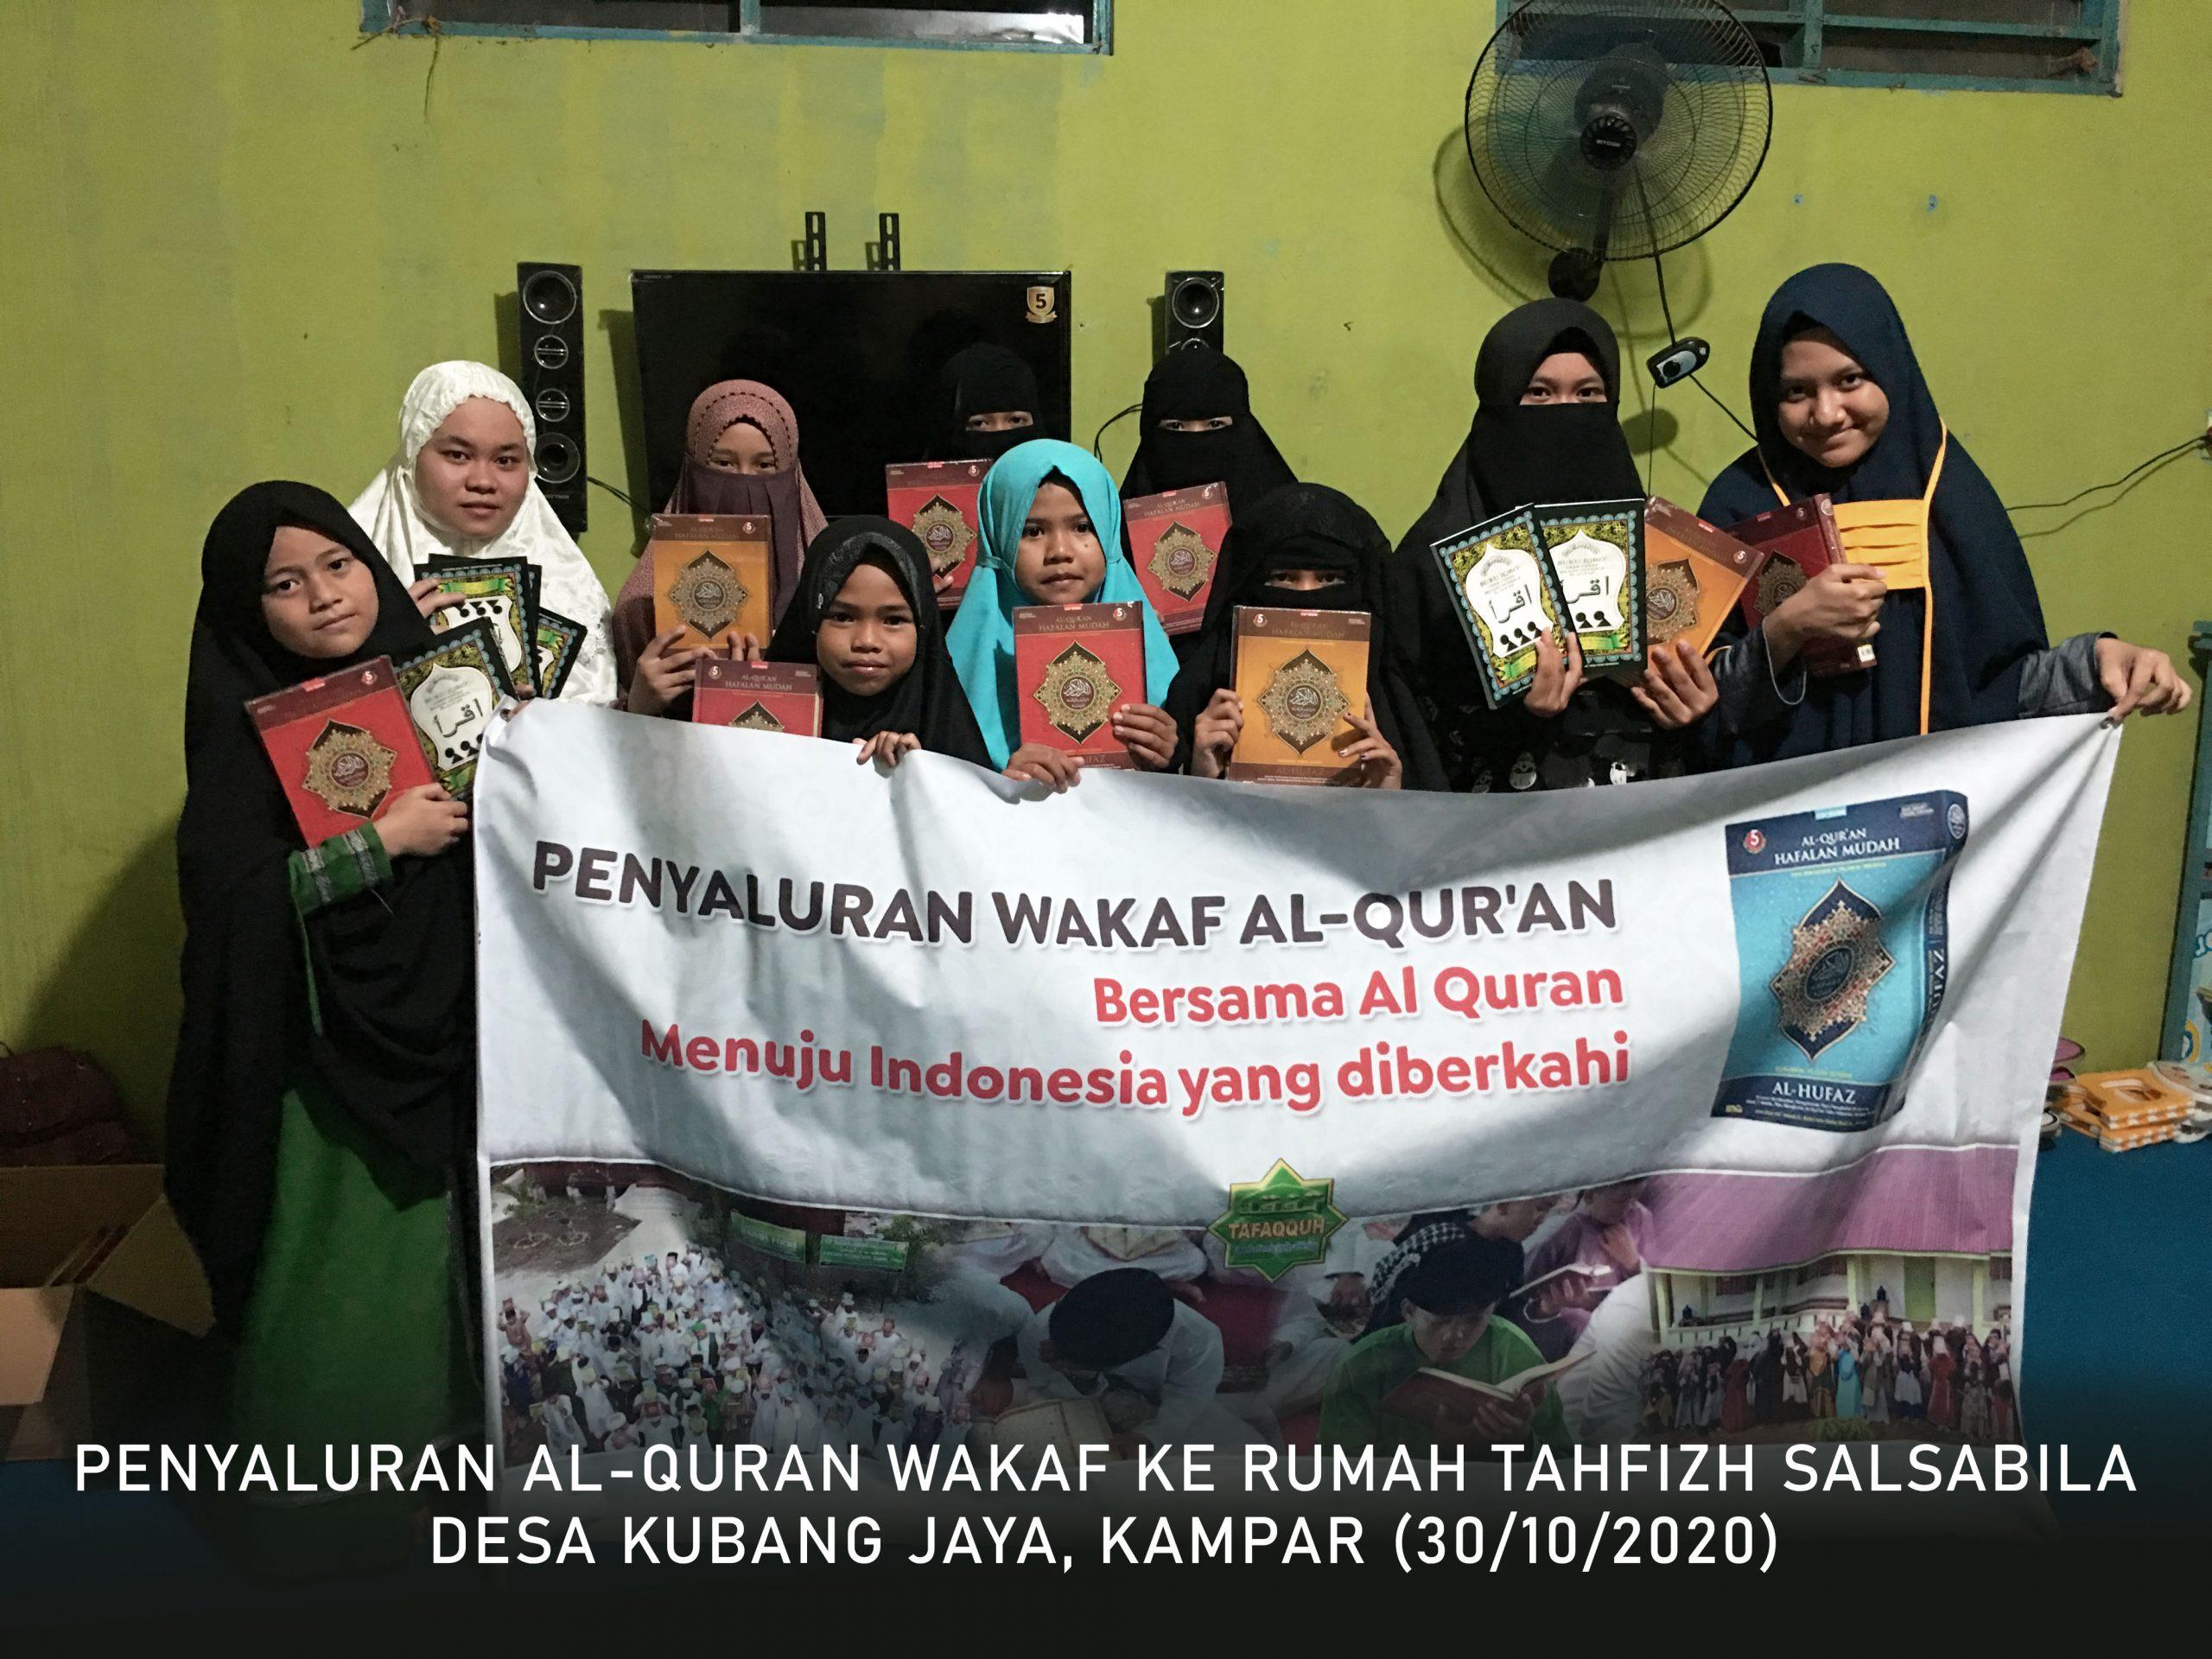 Penyaluran Wakaf Al-Quran ke Kubang Jaya, Kab. Kampar (30 Oktober 2020)